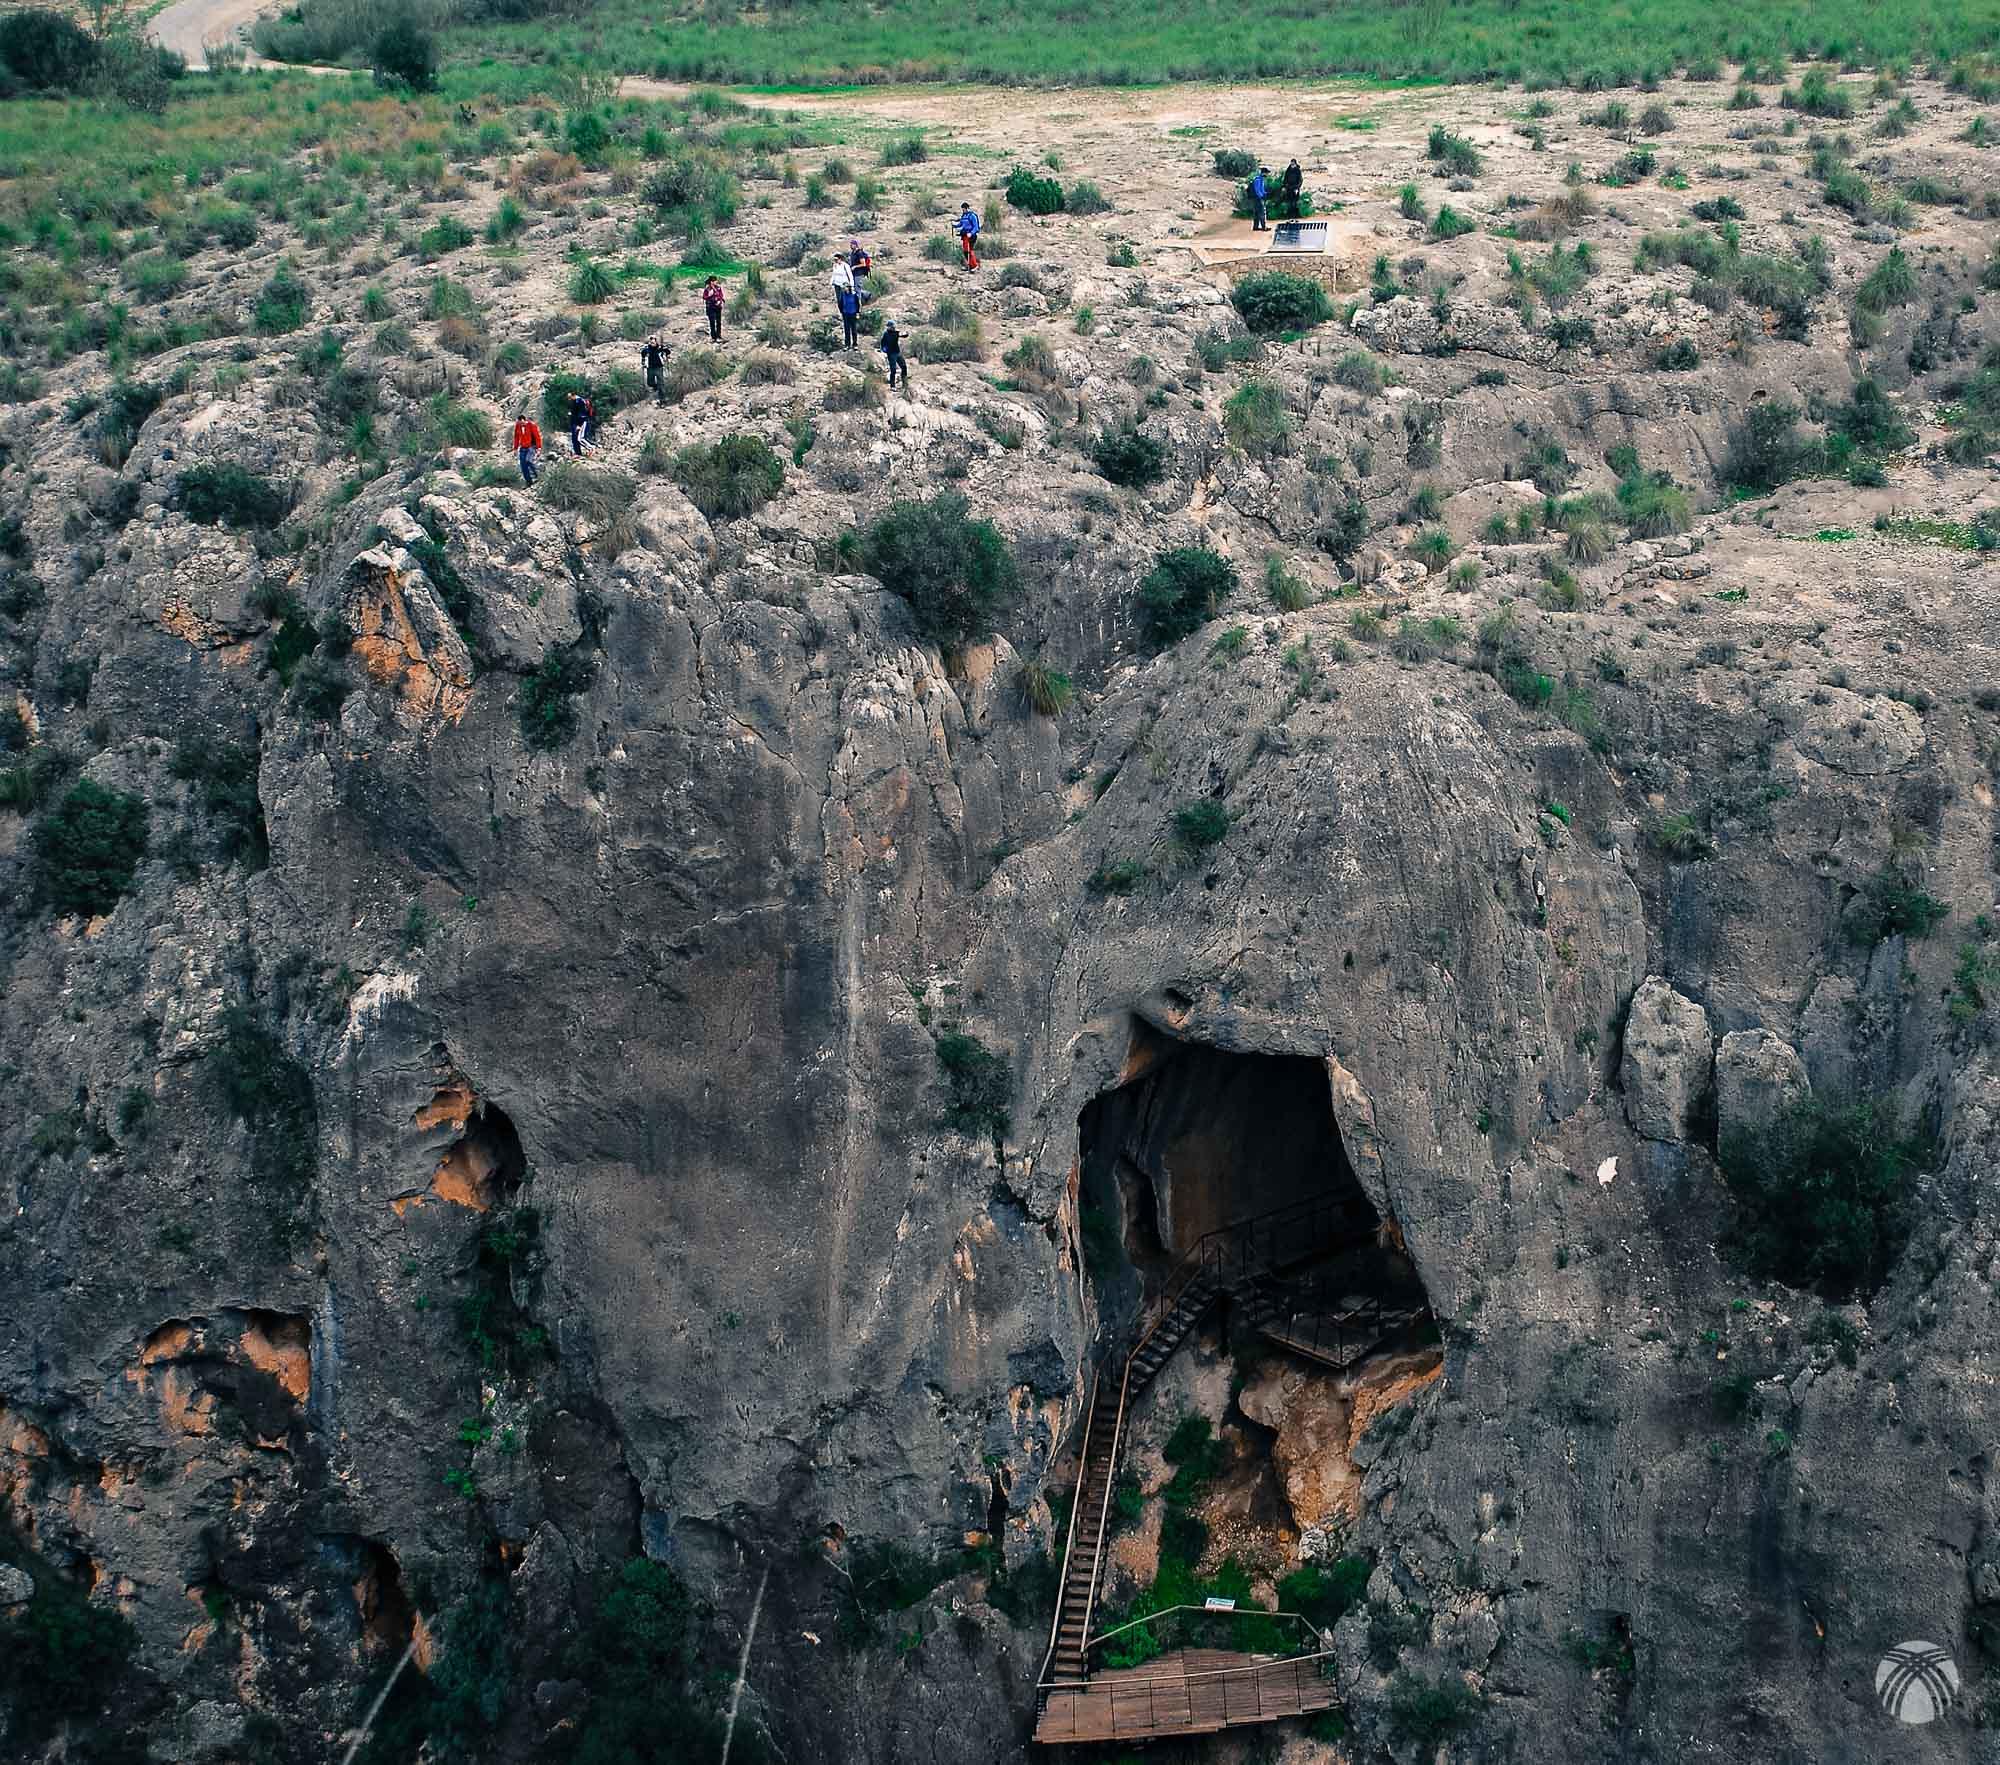 Perspectiva frontal de la Cueva de la Serreta